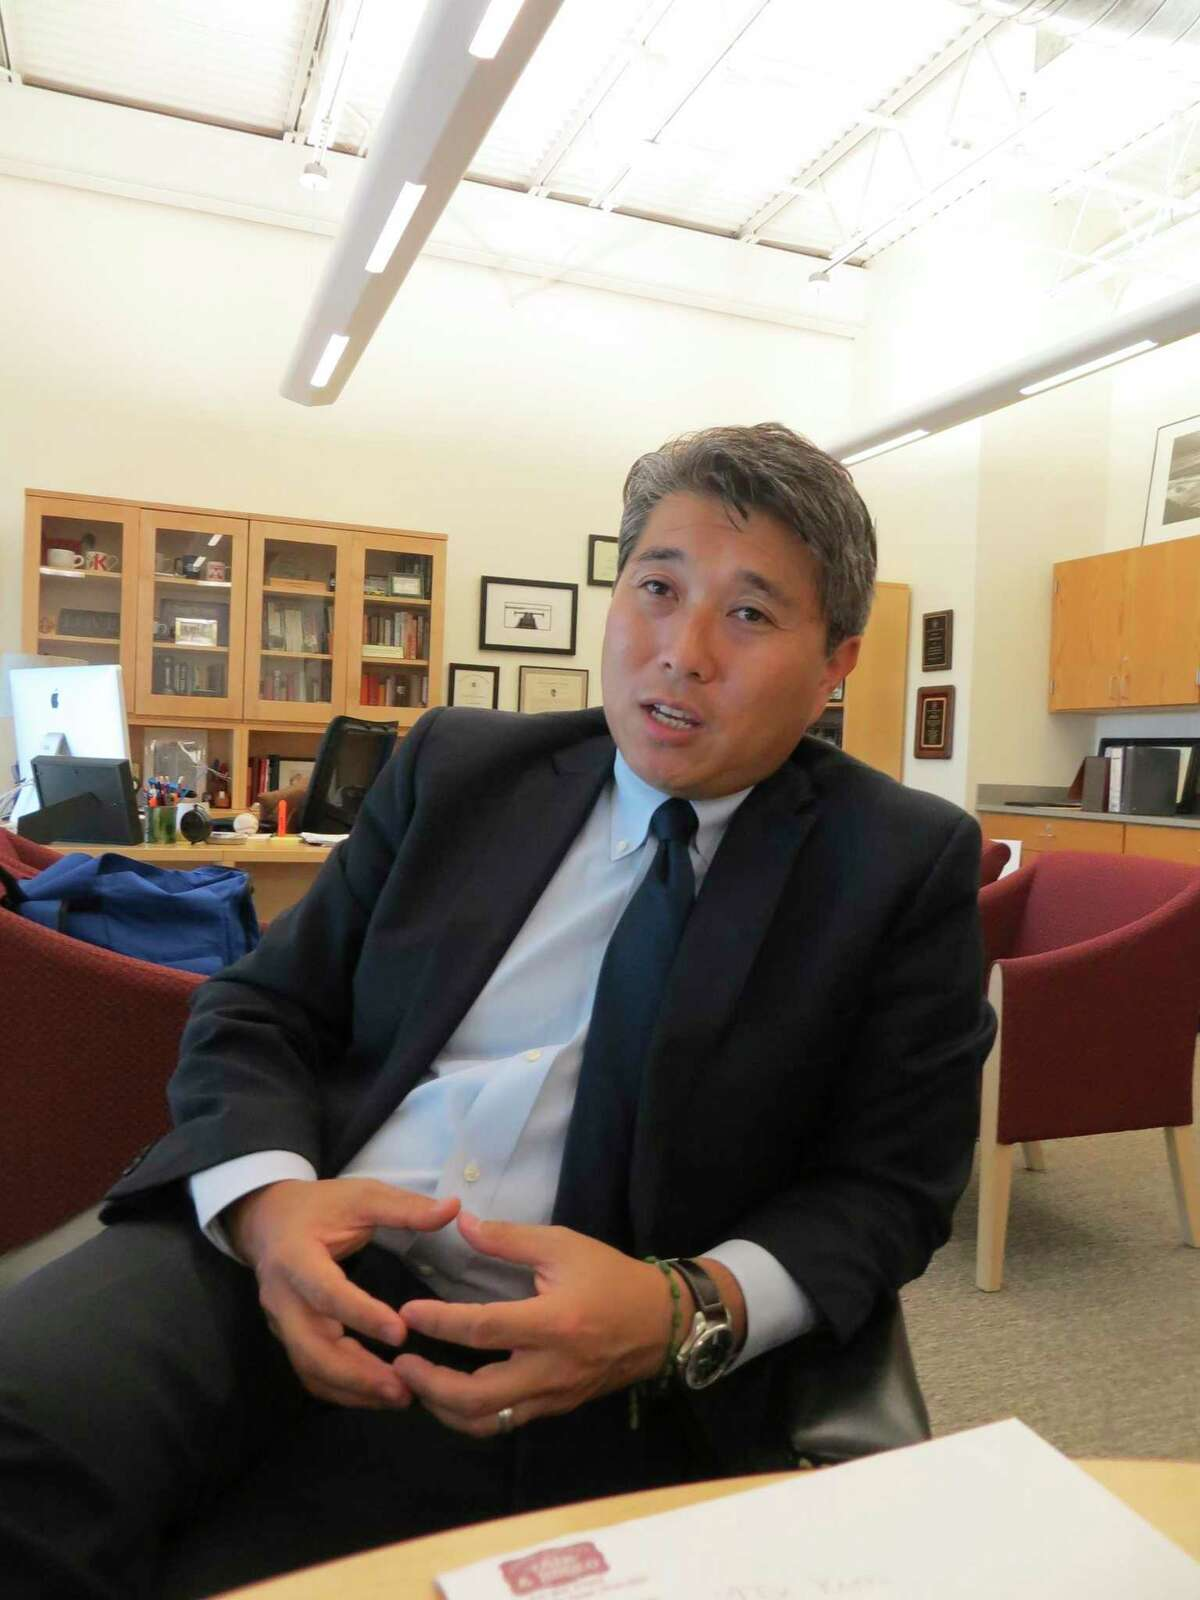 Comal County ISD Superintendent Andrew Kim